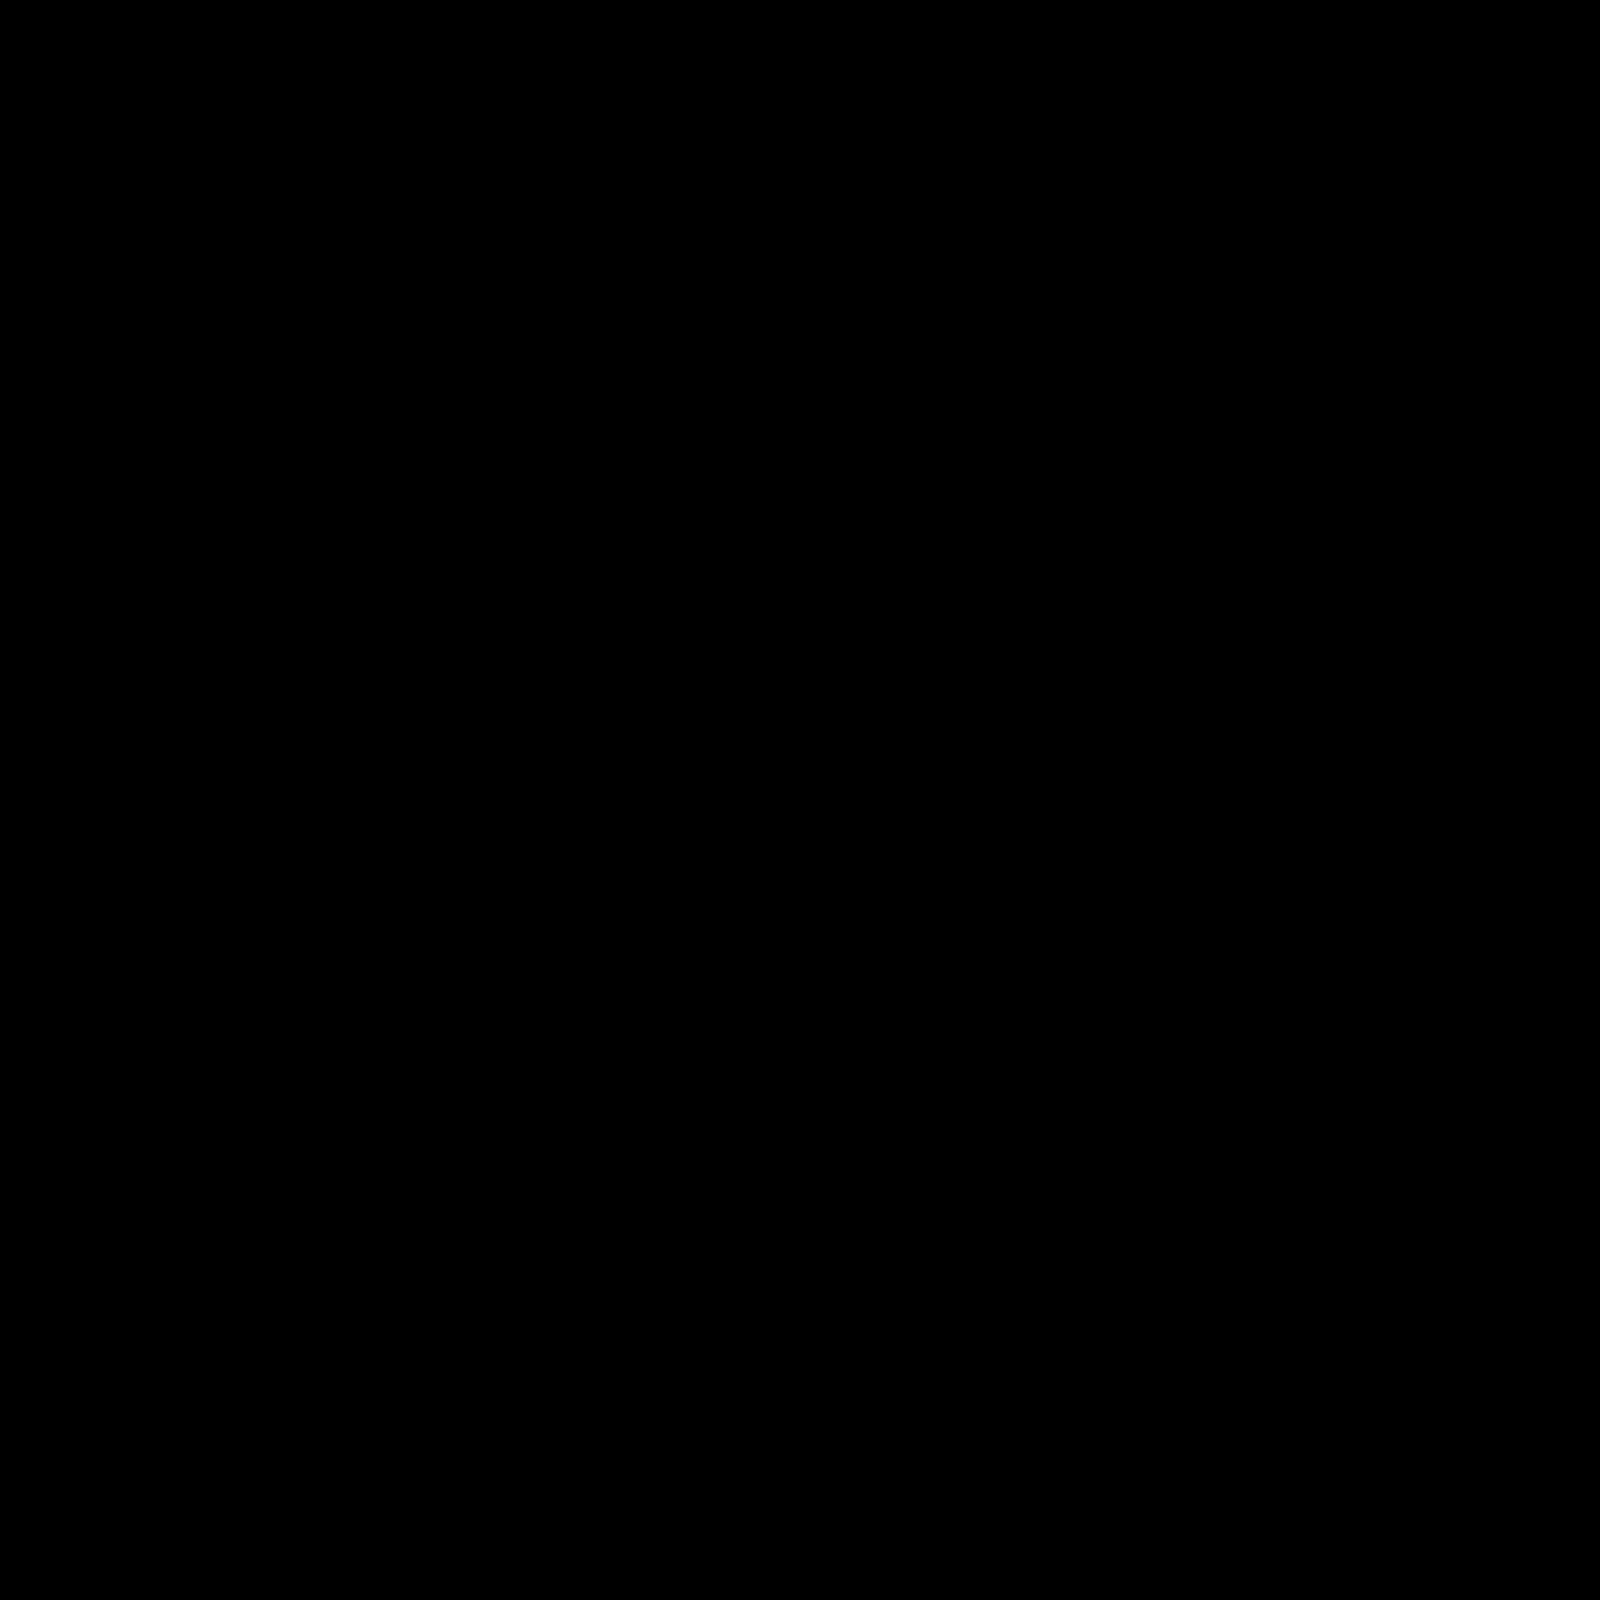 Burn CD icon - Logo Burn PNG